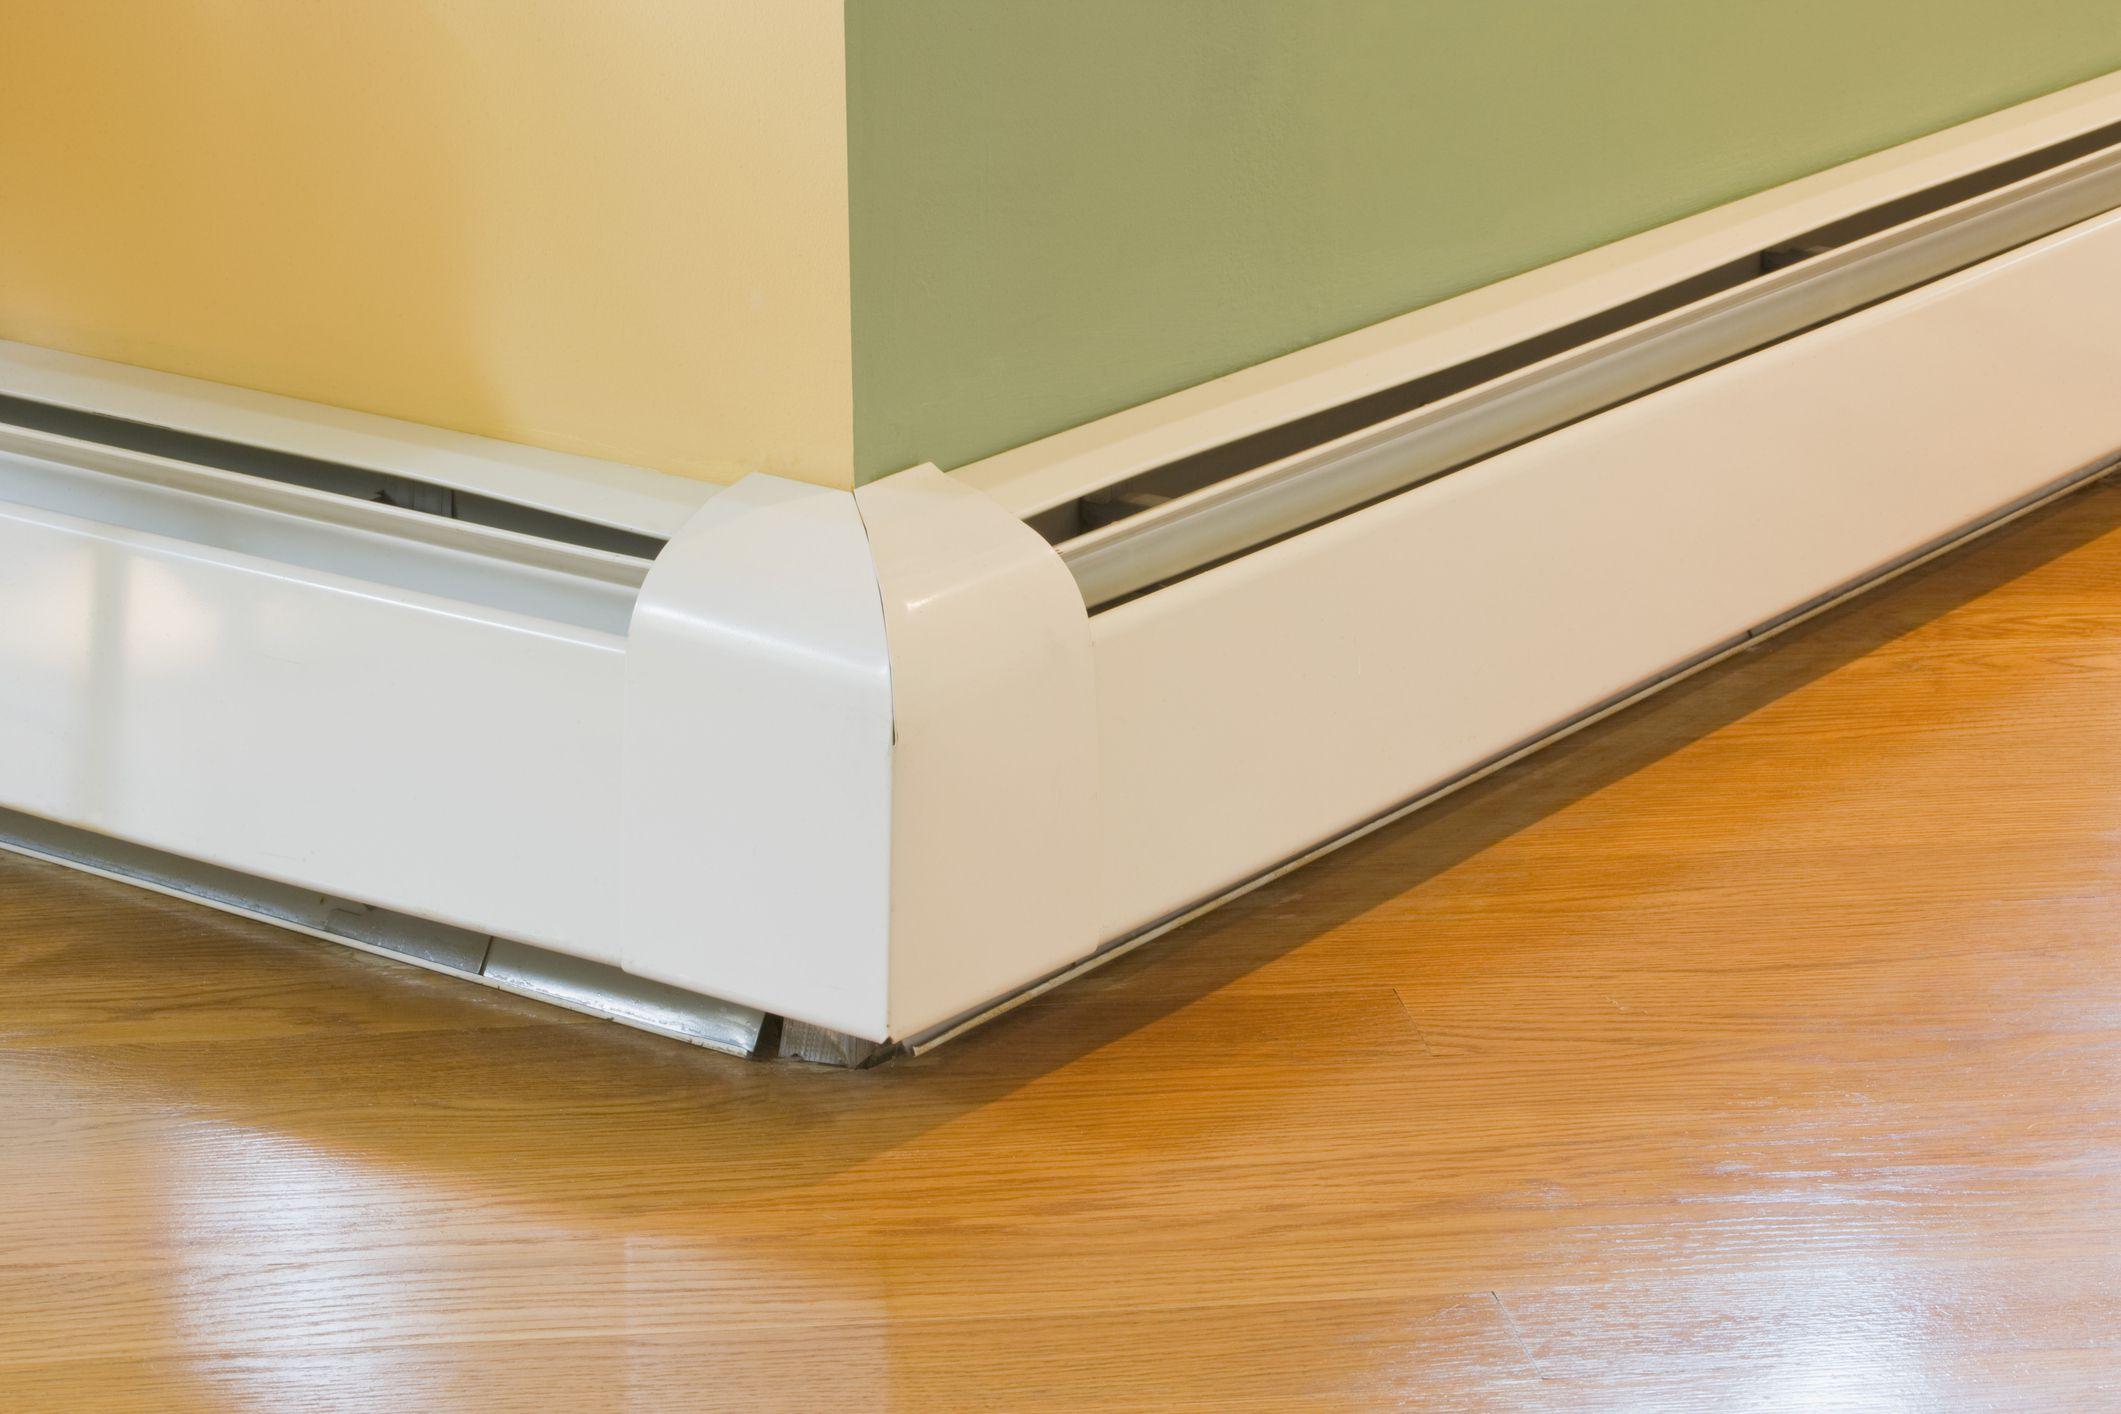 diy heated system floors zone heating the company floor closedsystem radiant closed